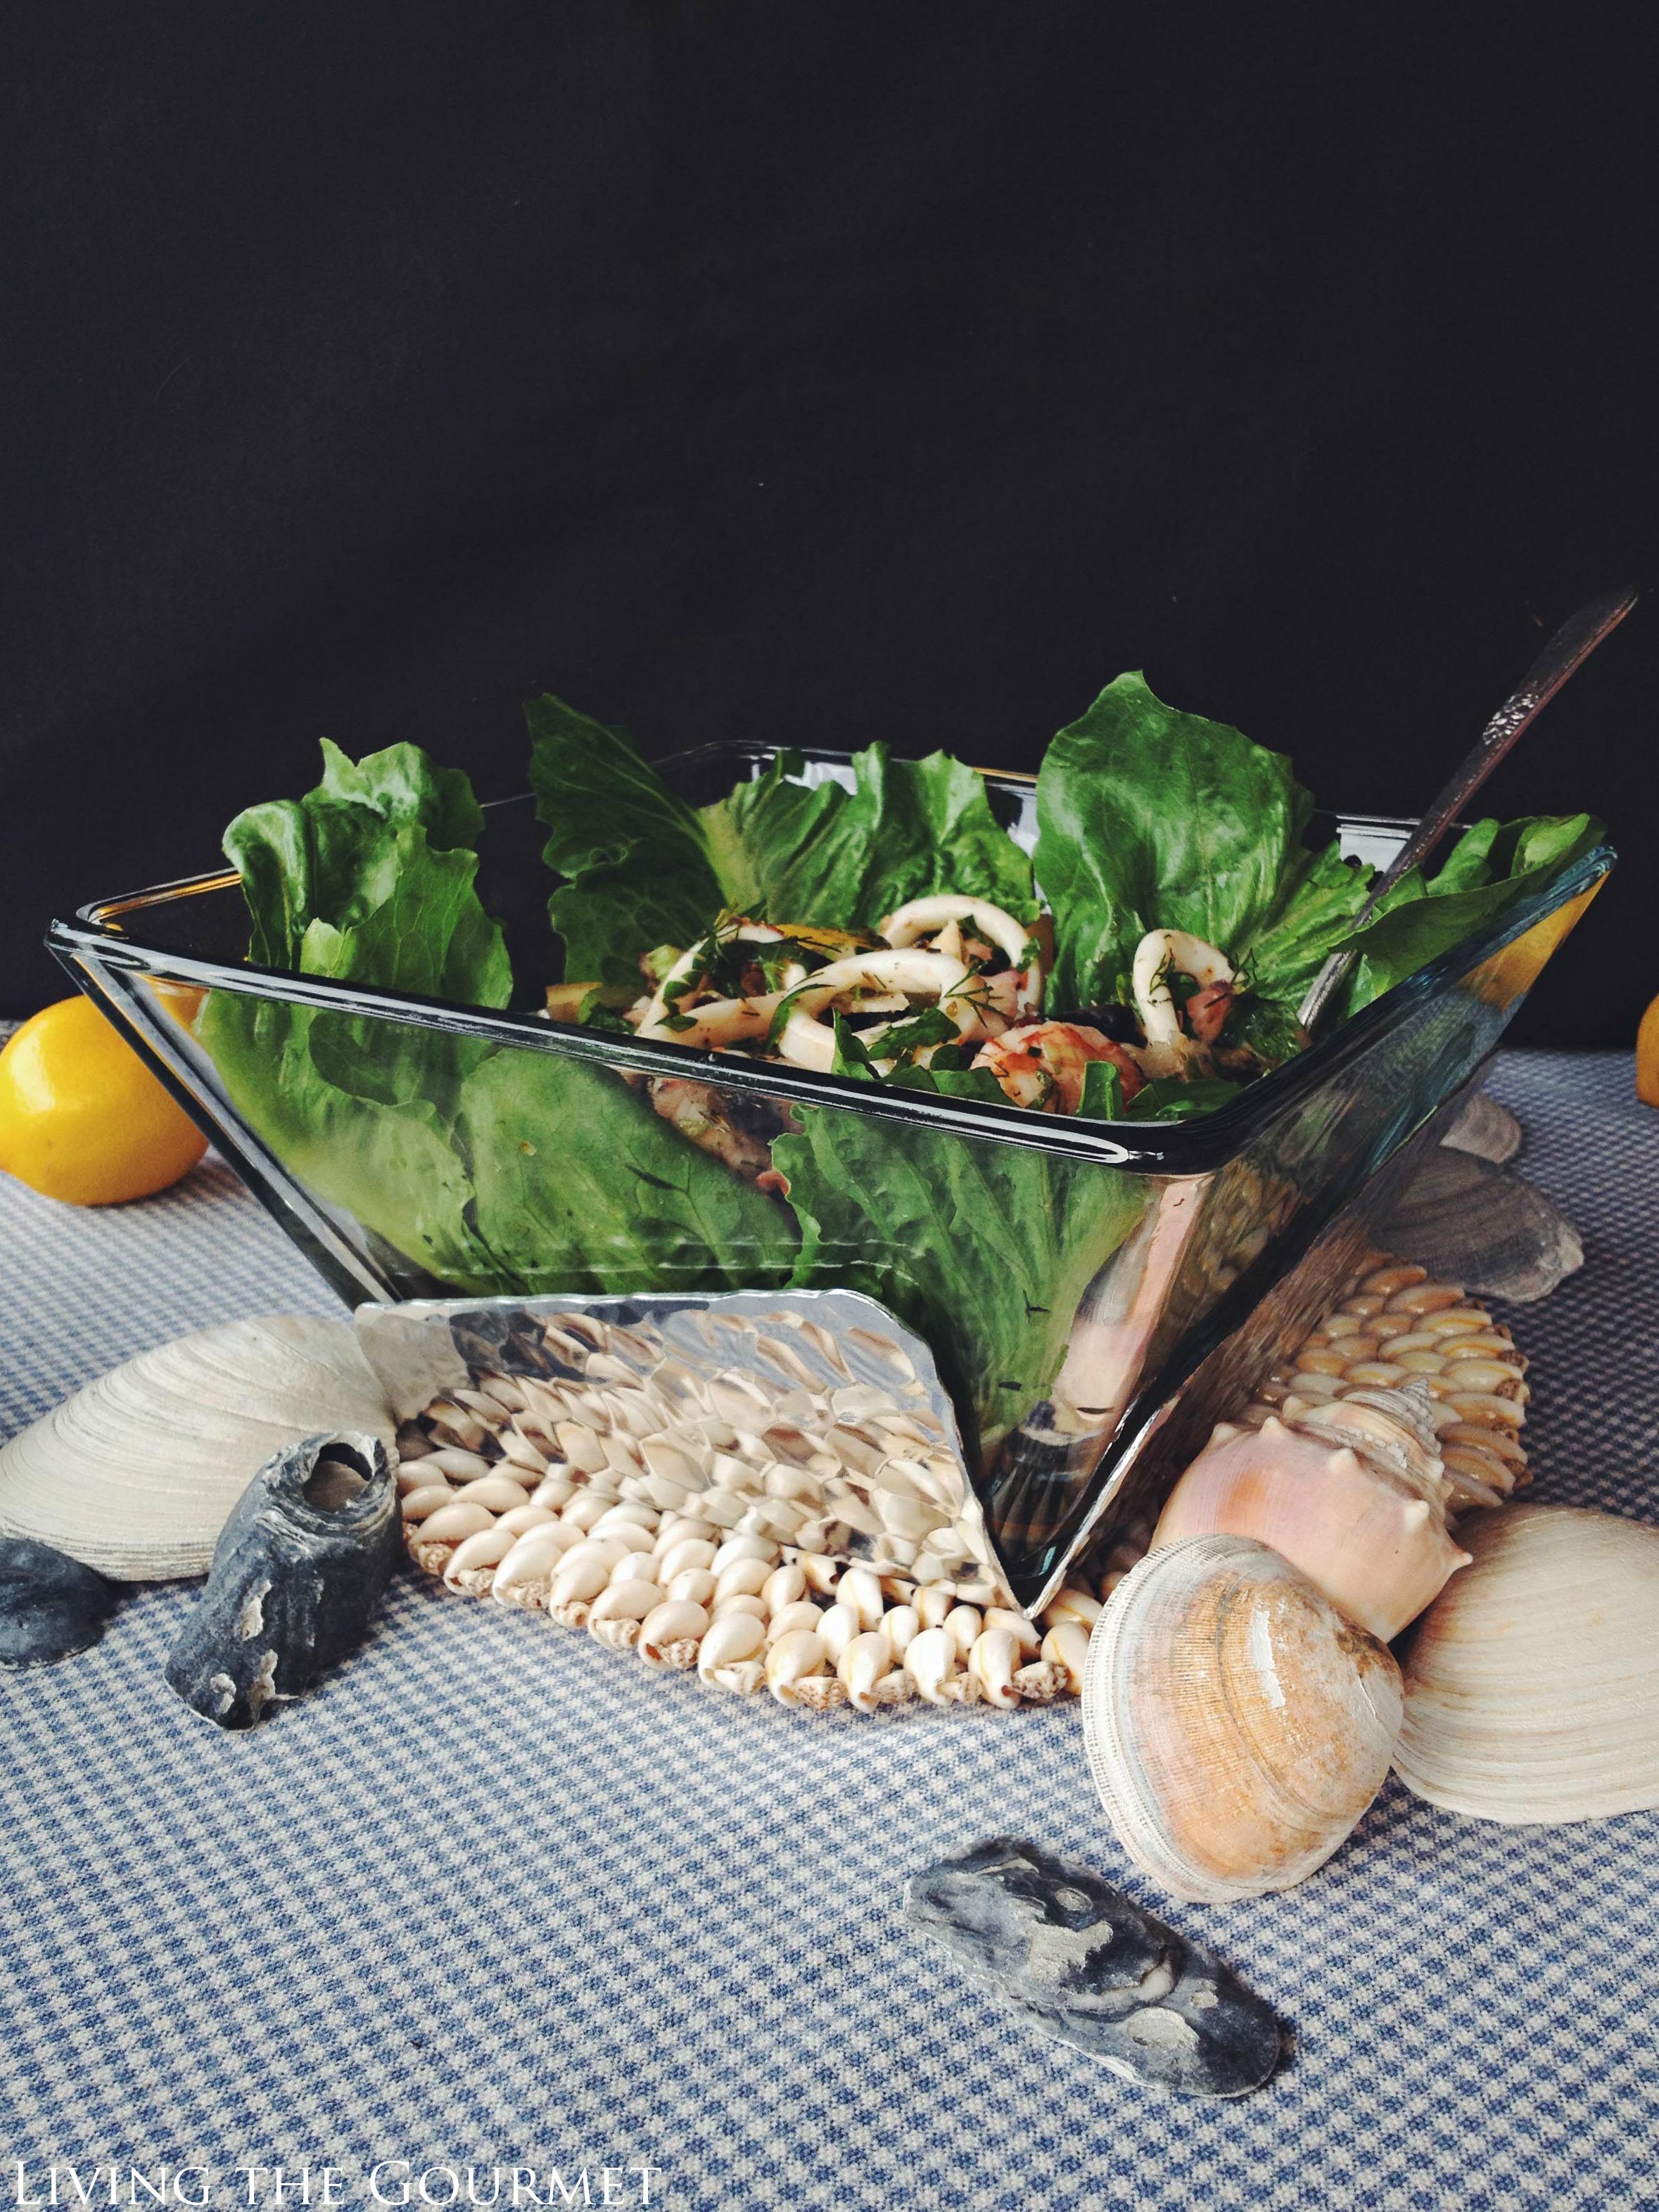 Living the Gourmet: Calamari and Shrimp Salad #AD